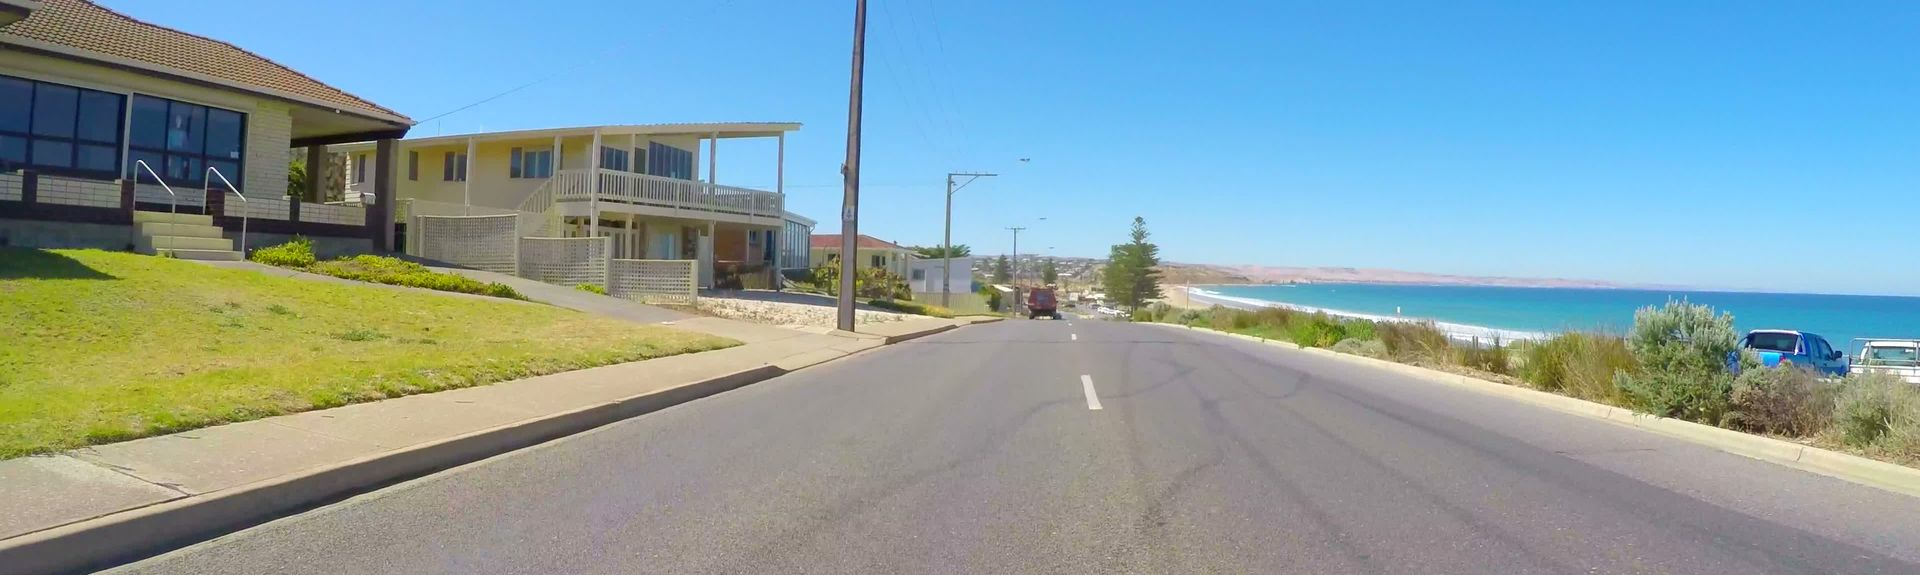 Moana Beach, SA, Australia